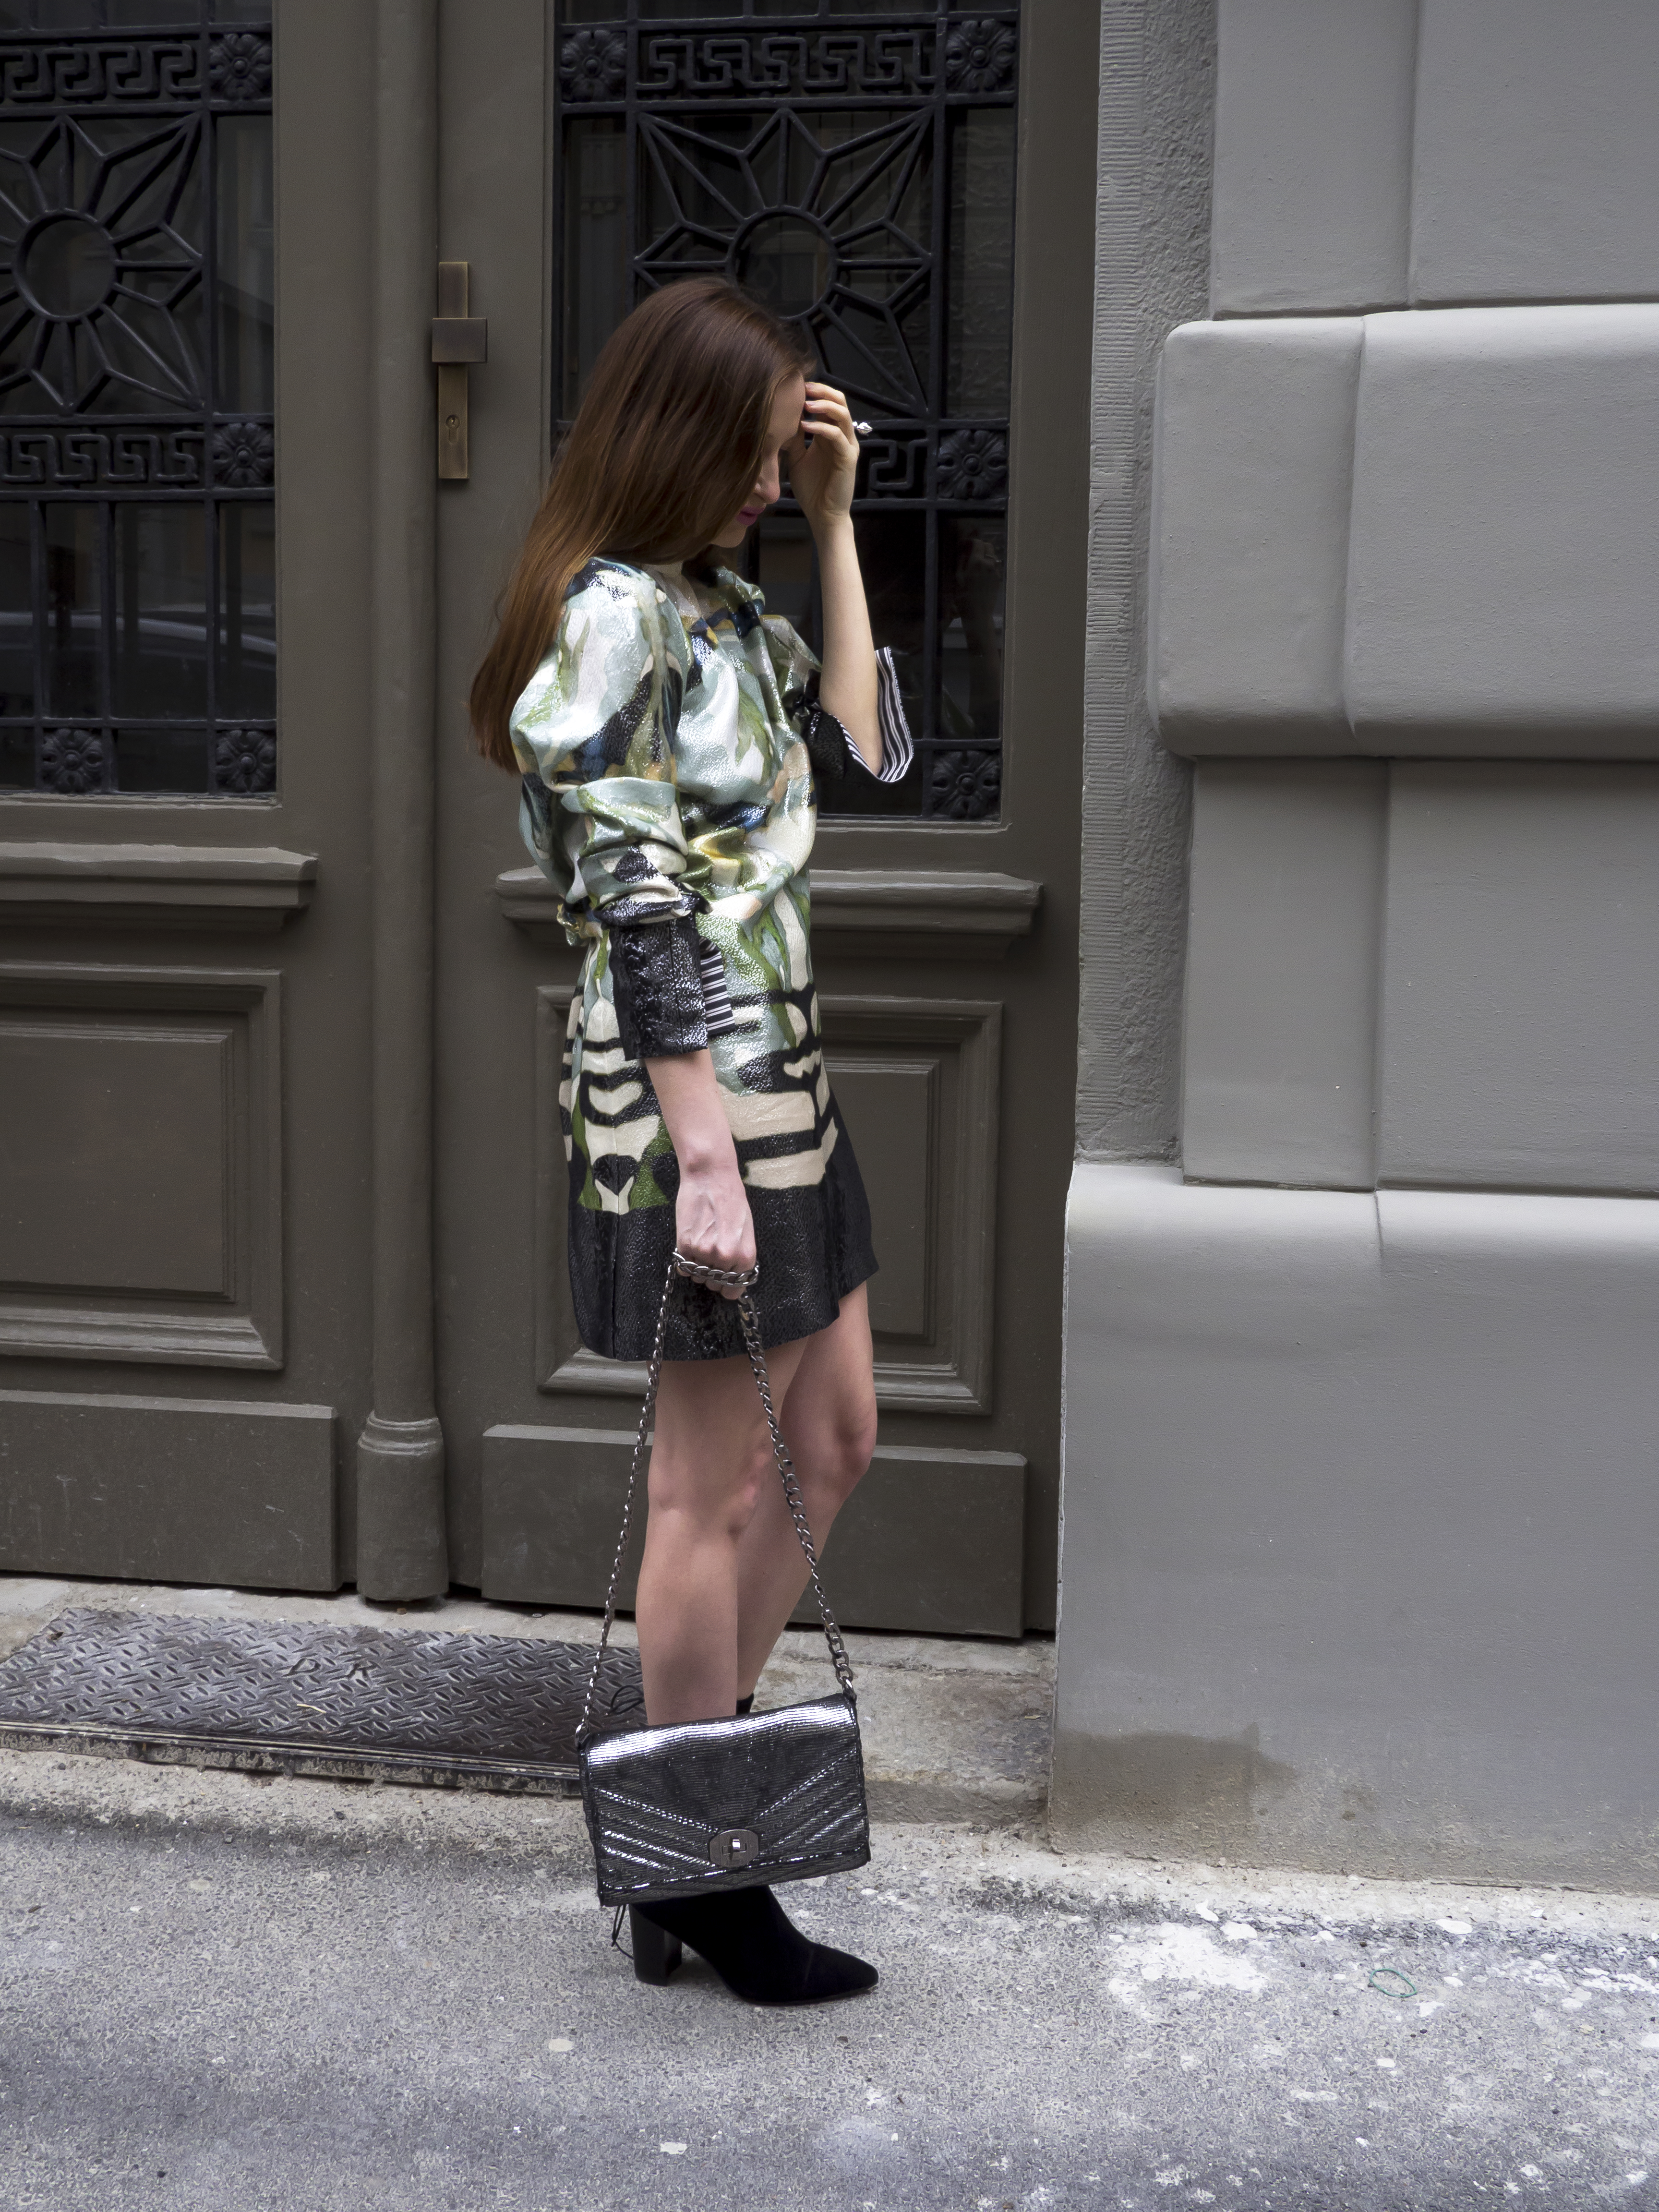 Recyklovaná móda - Monika Filipová stylista, fashion stylist, personal stylist